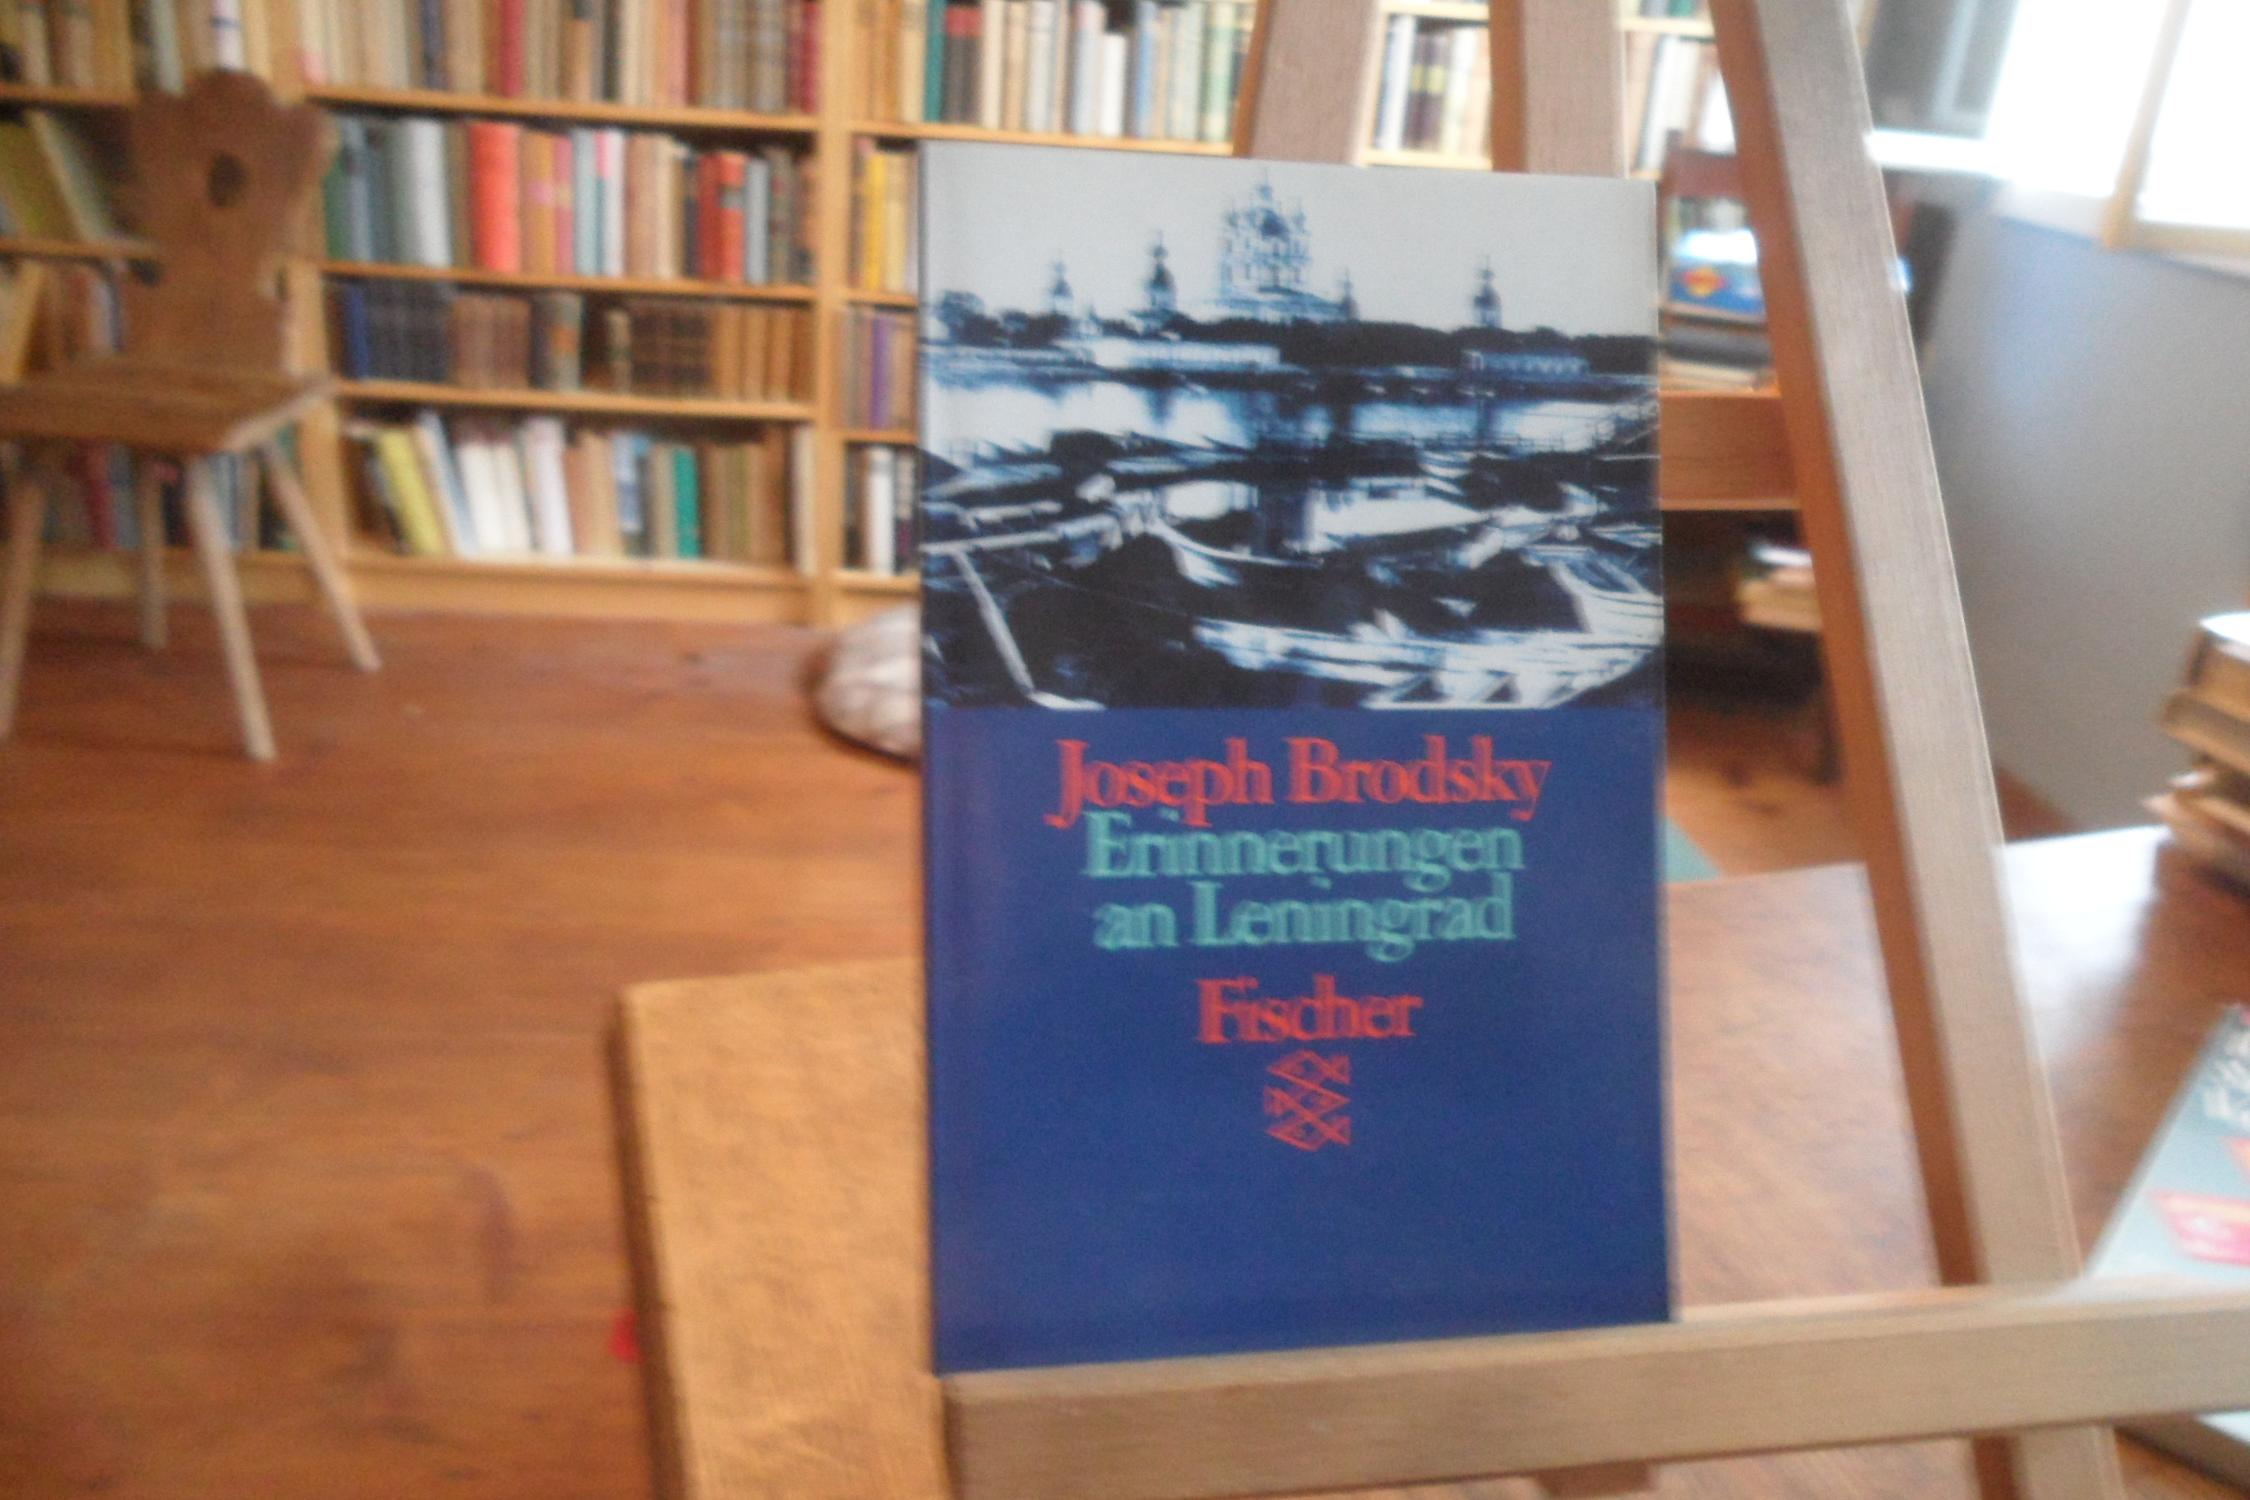 Erinnerungen an Leningrad.: Brodsky, Joseph: